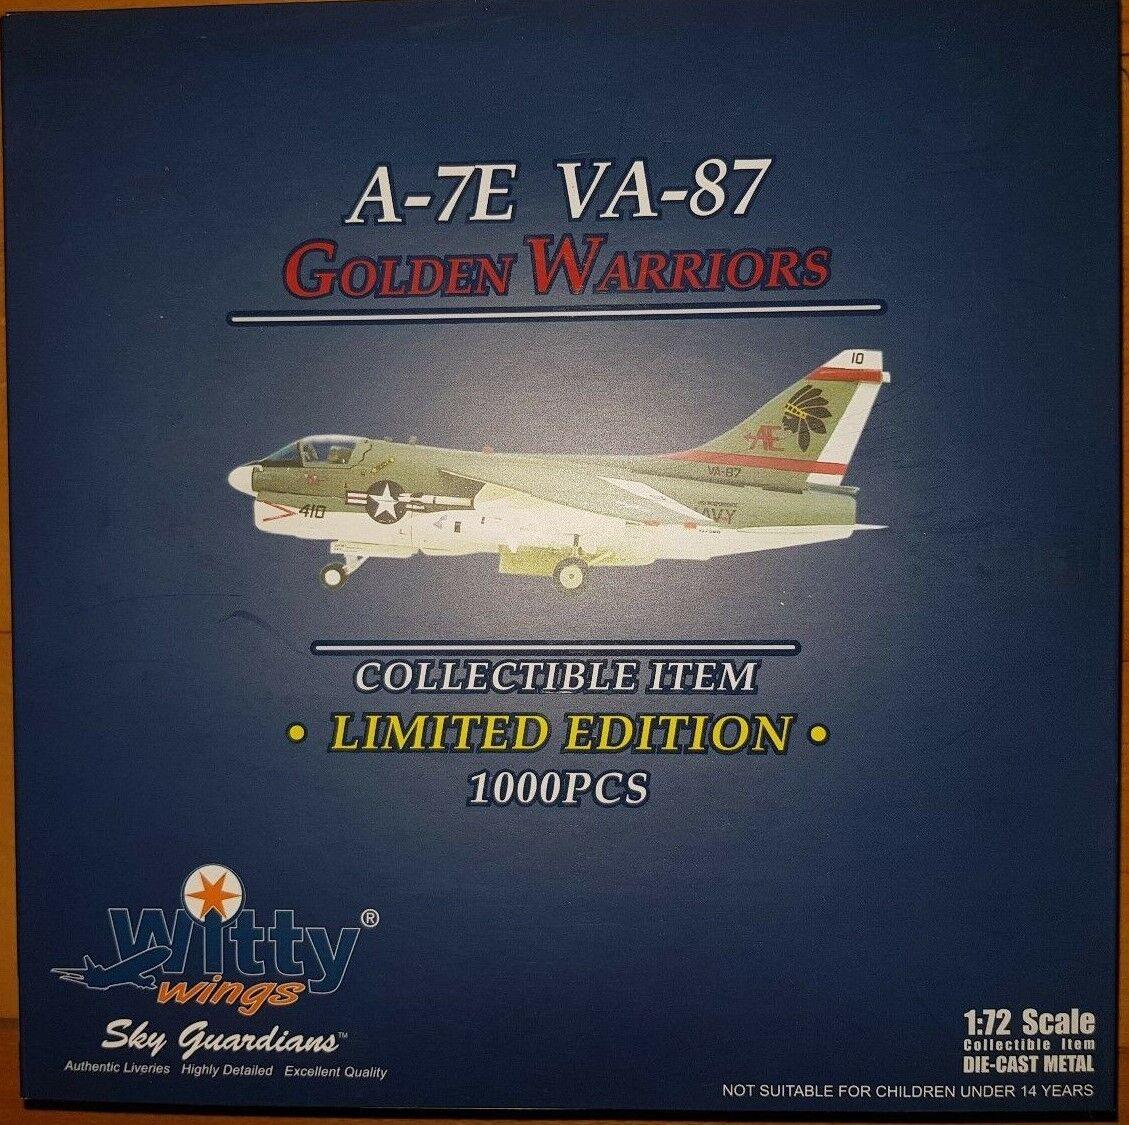 Witty Wings a-7a CORSAIR II USN va-87 oroEN Warriors, ae410 1 72 metallo RAR